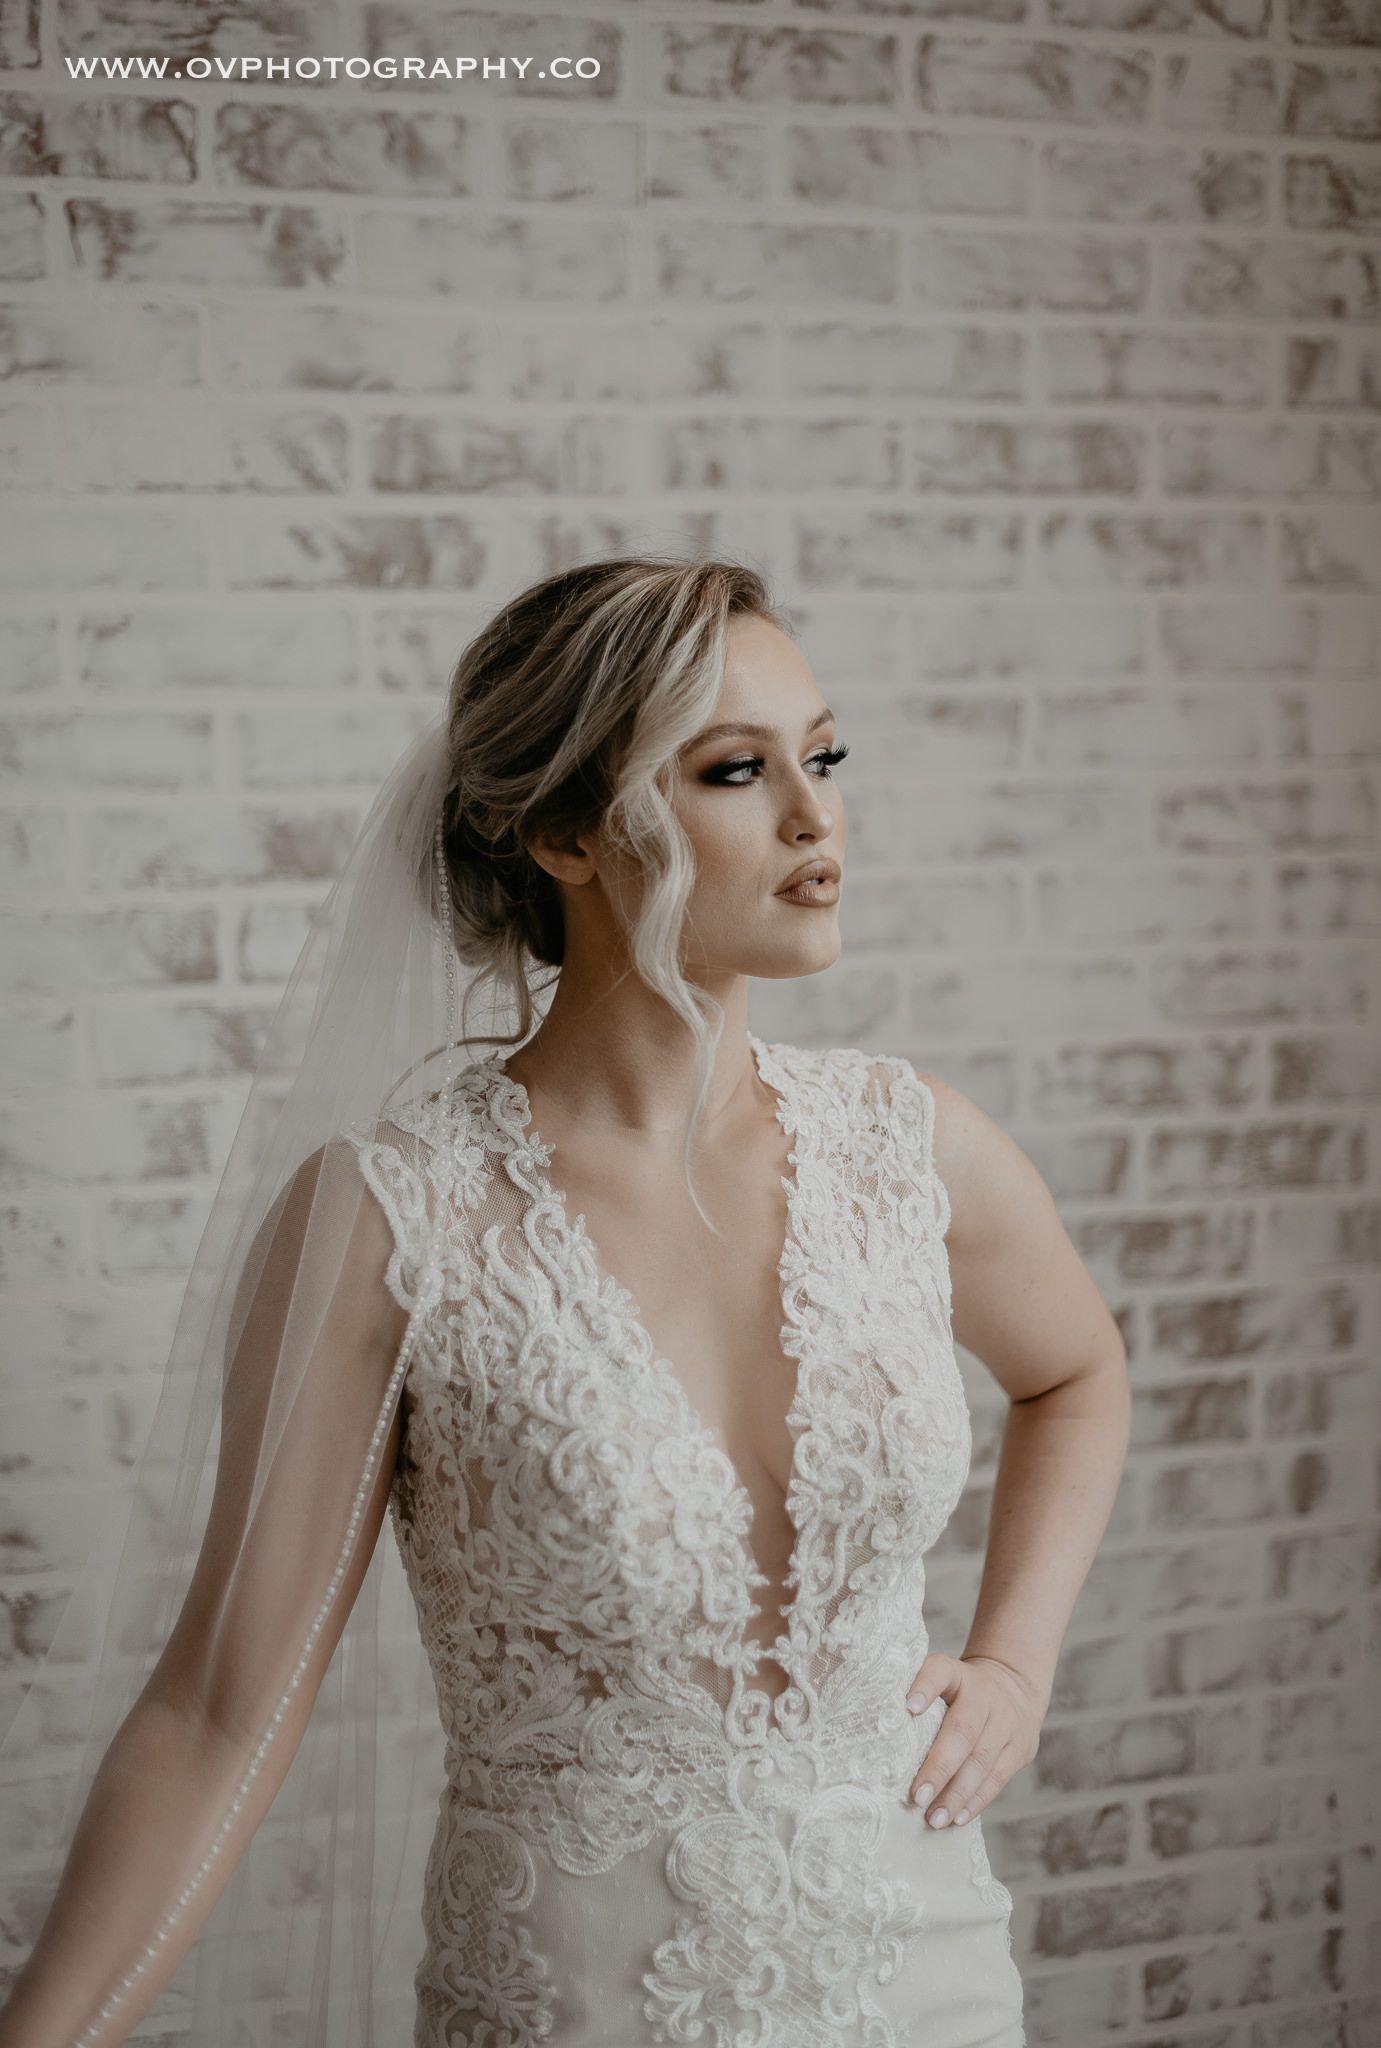 bridal hair & makeup | image by ov photography | wedding